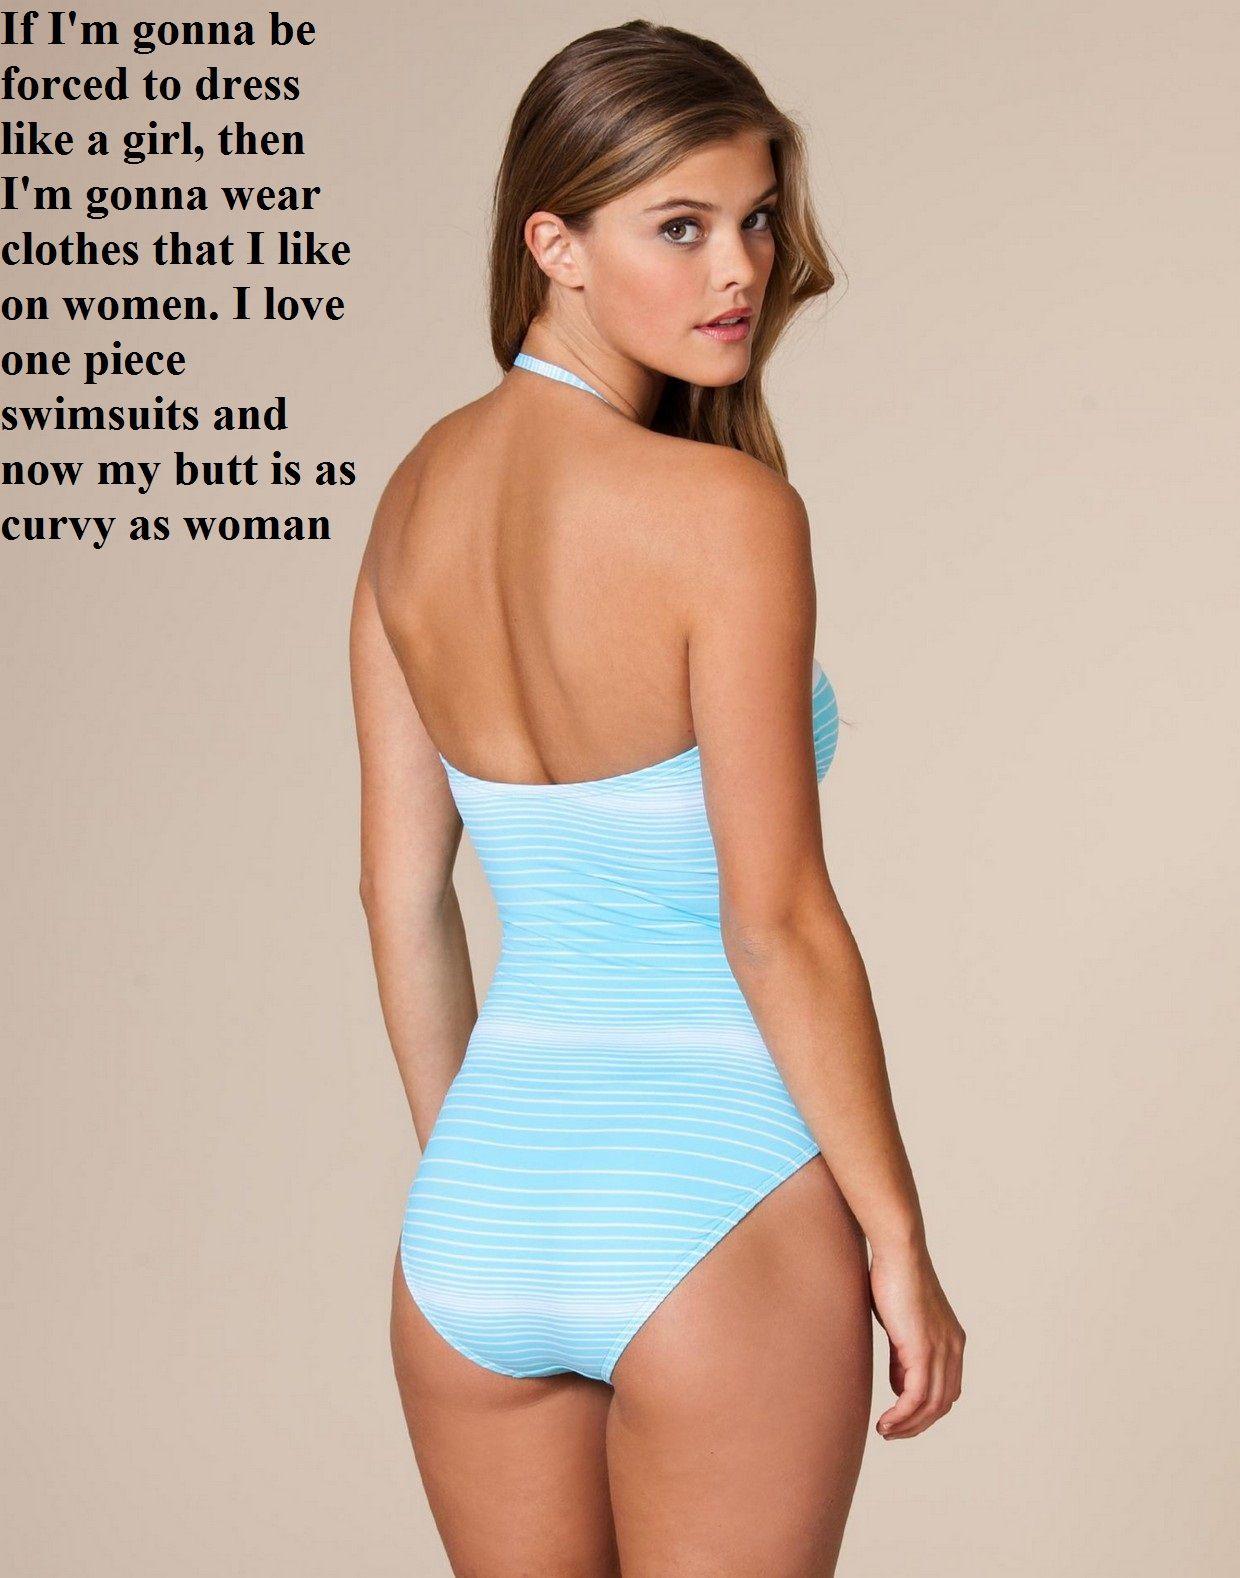 Bikini Tg captions